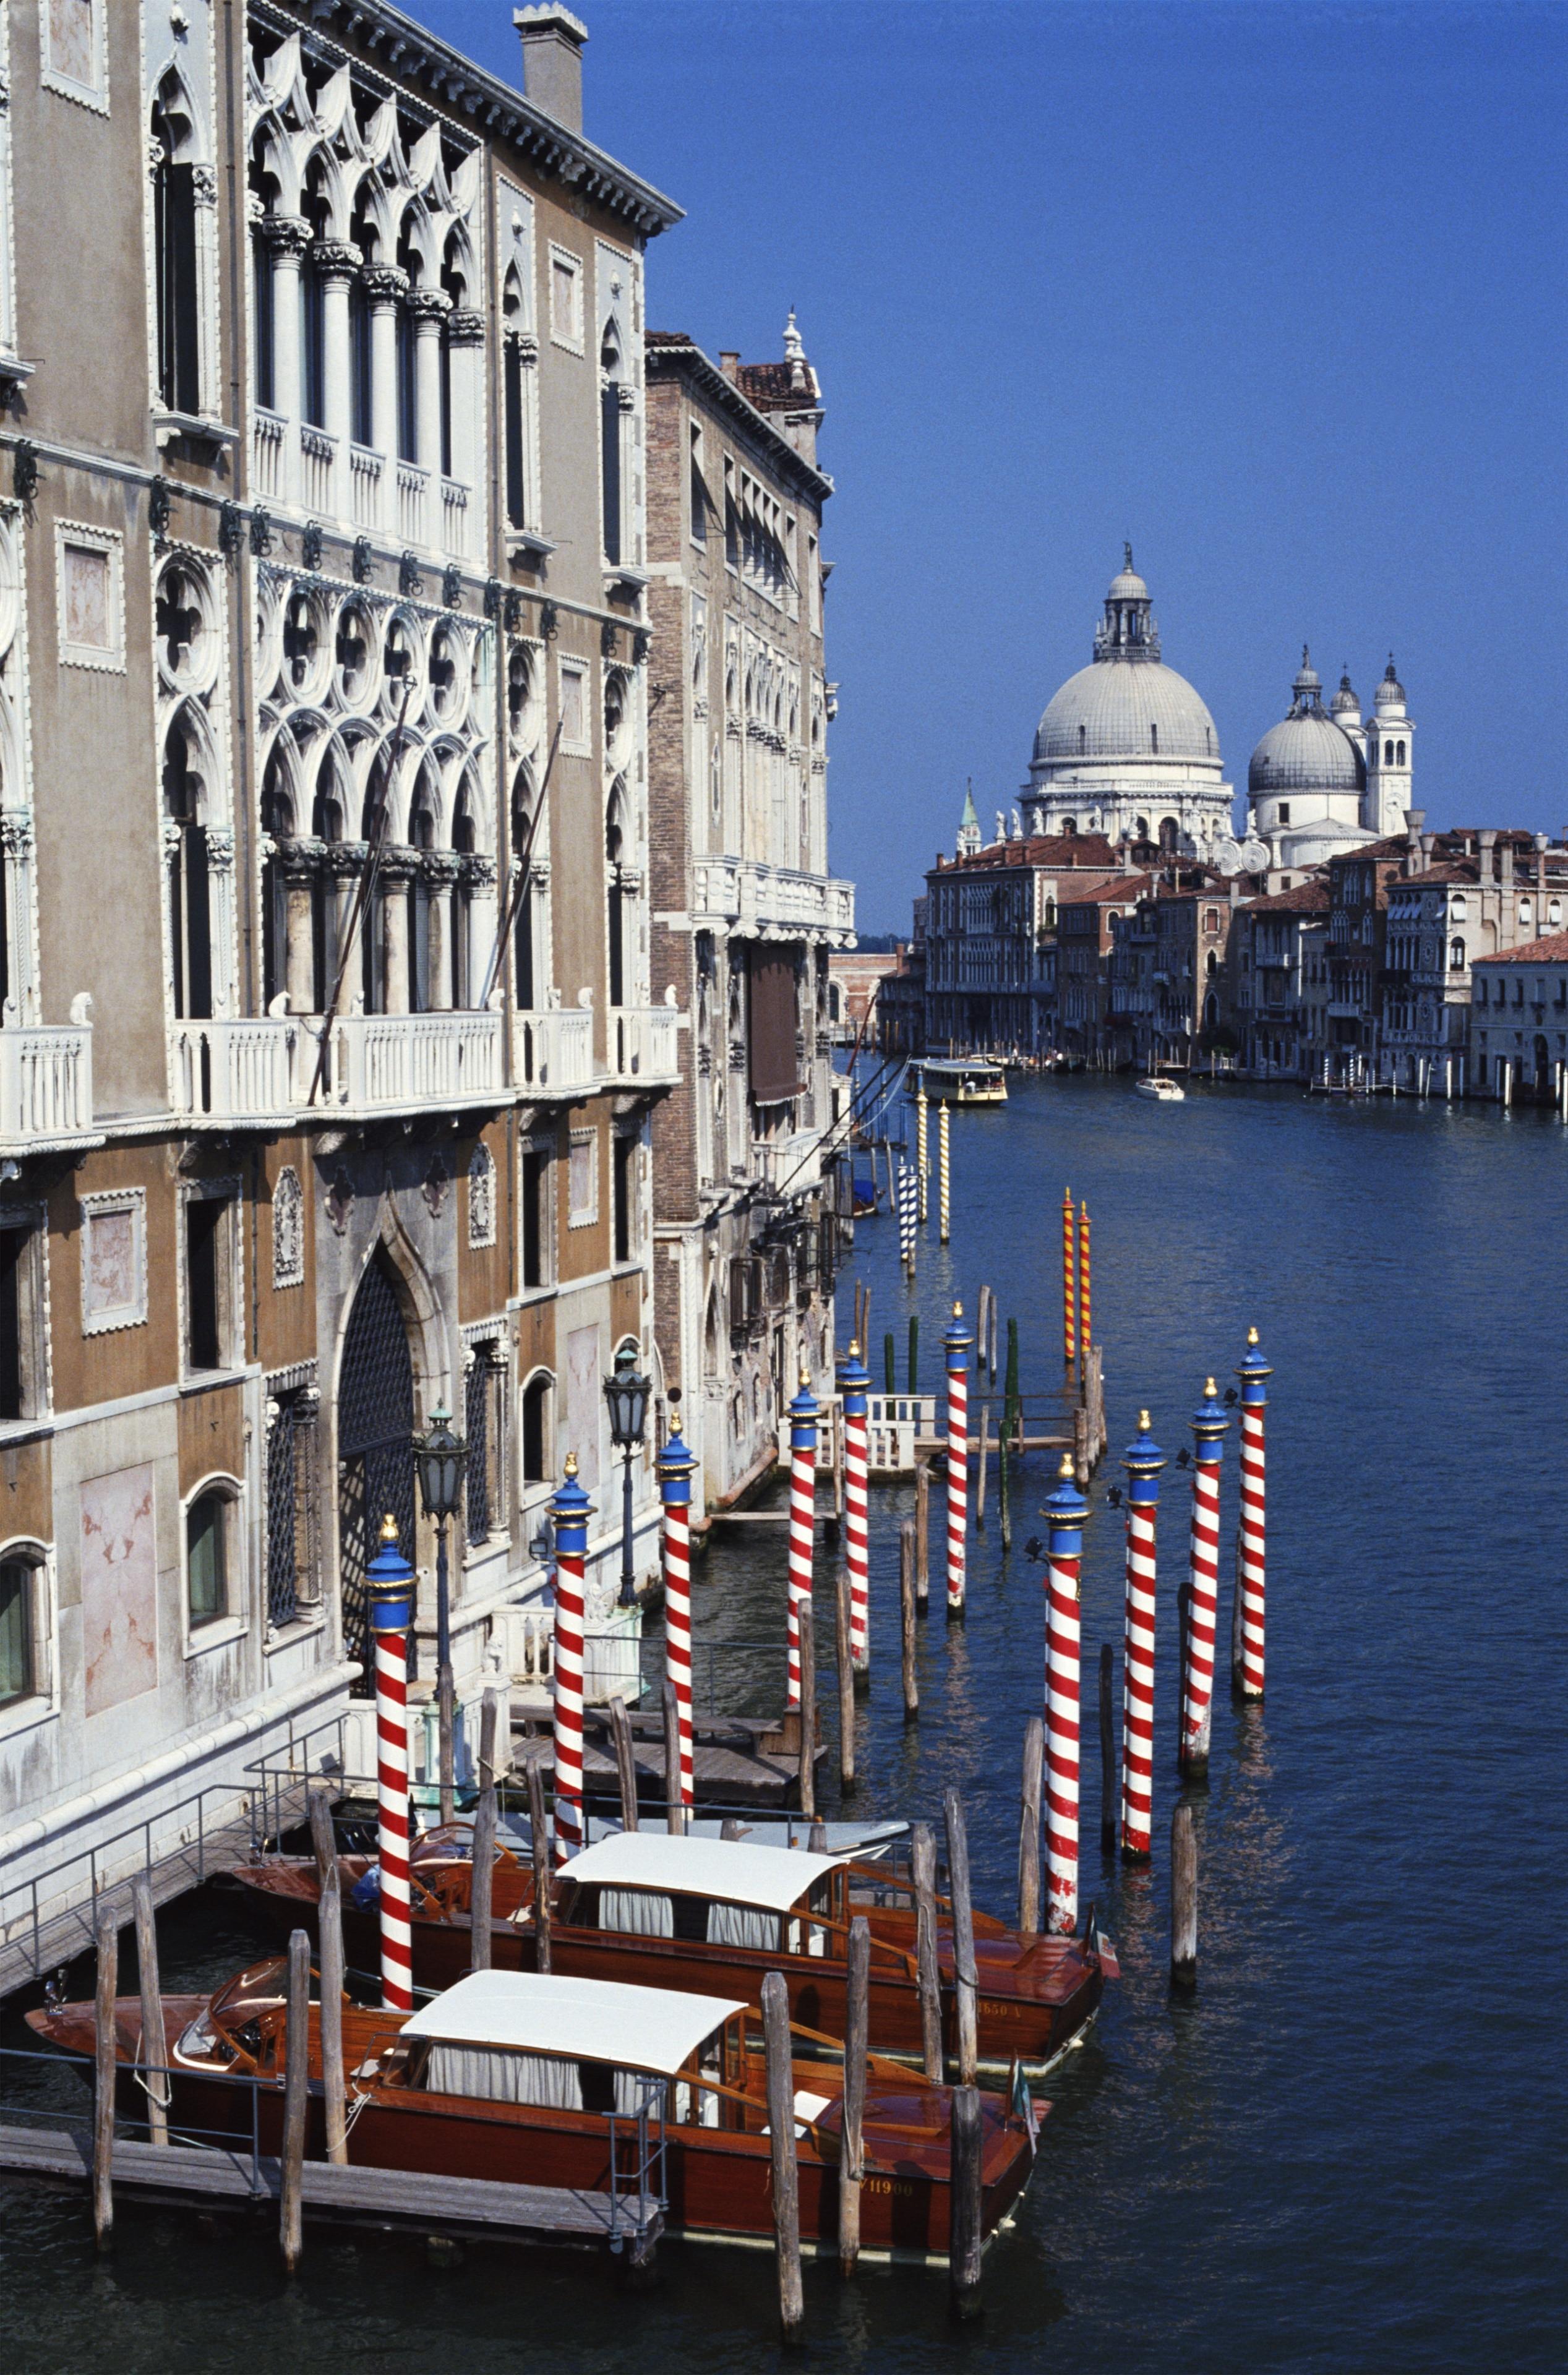 Venice Canals, Venice, California, United States of America